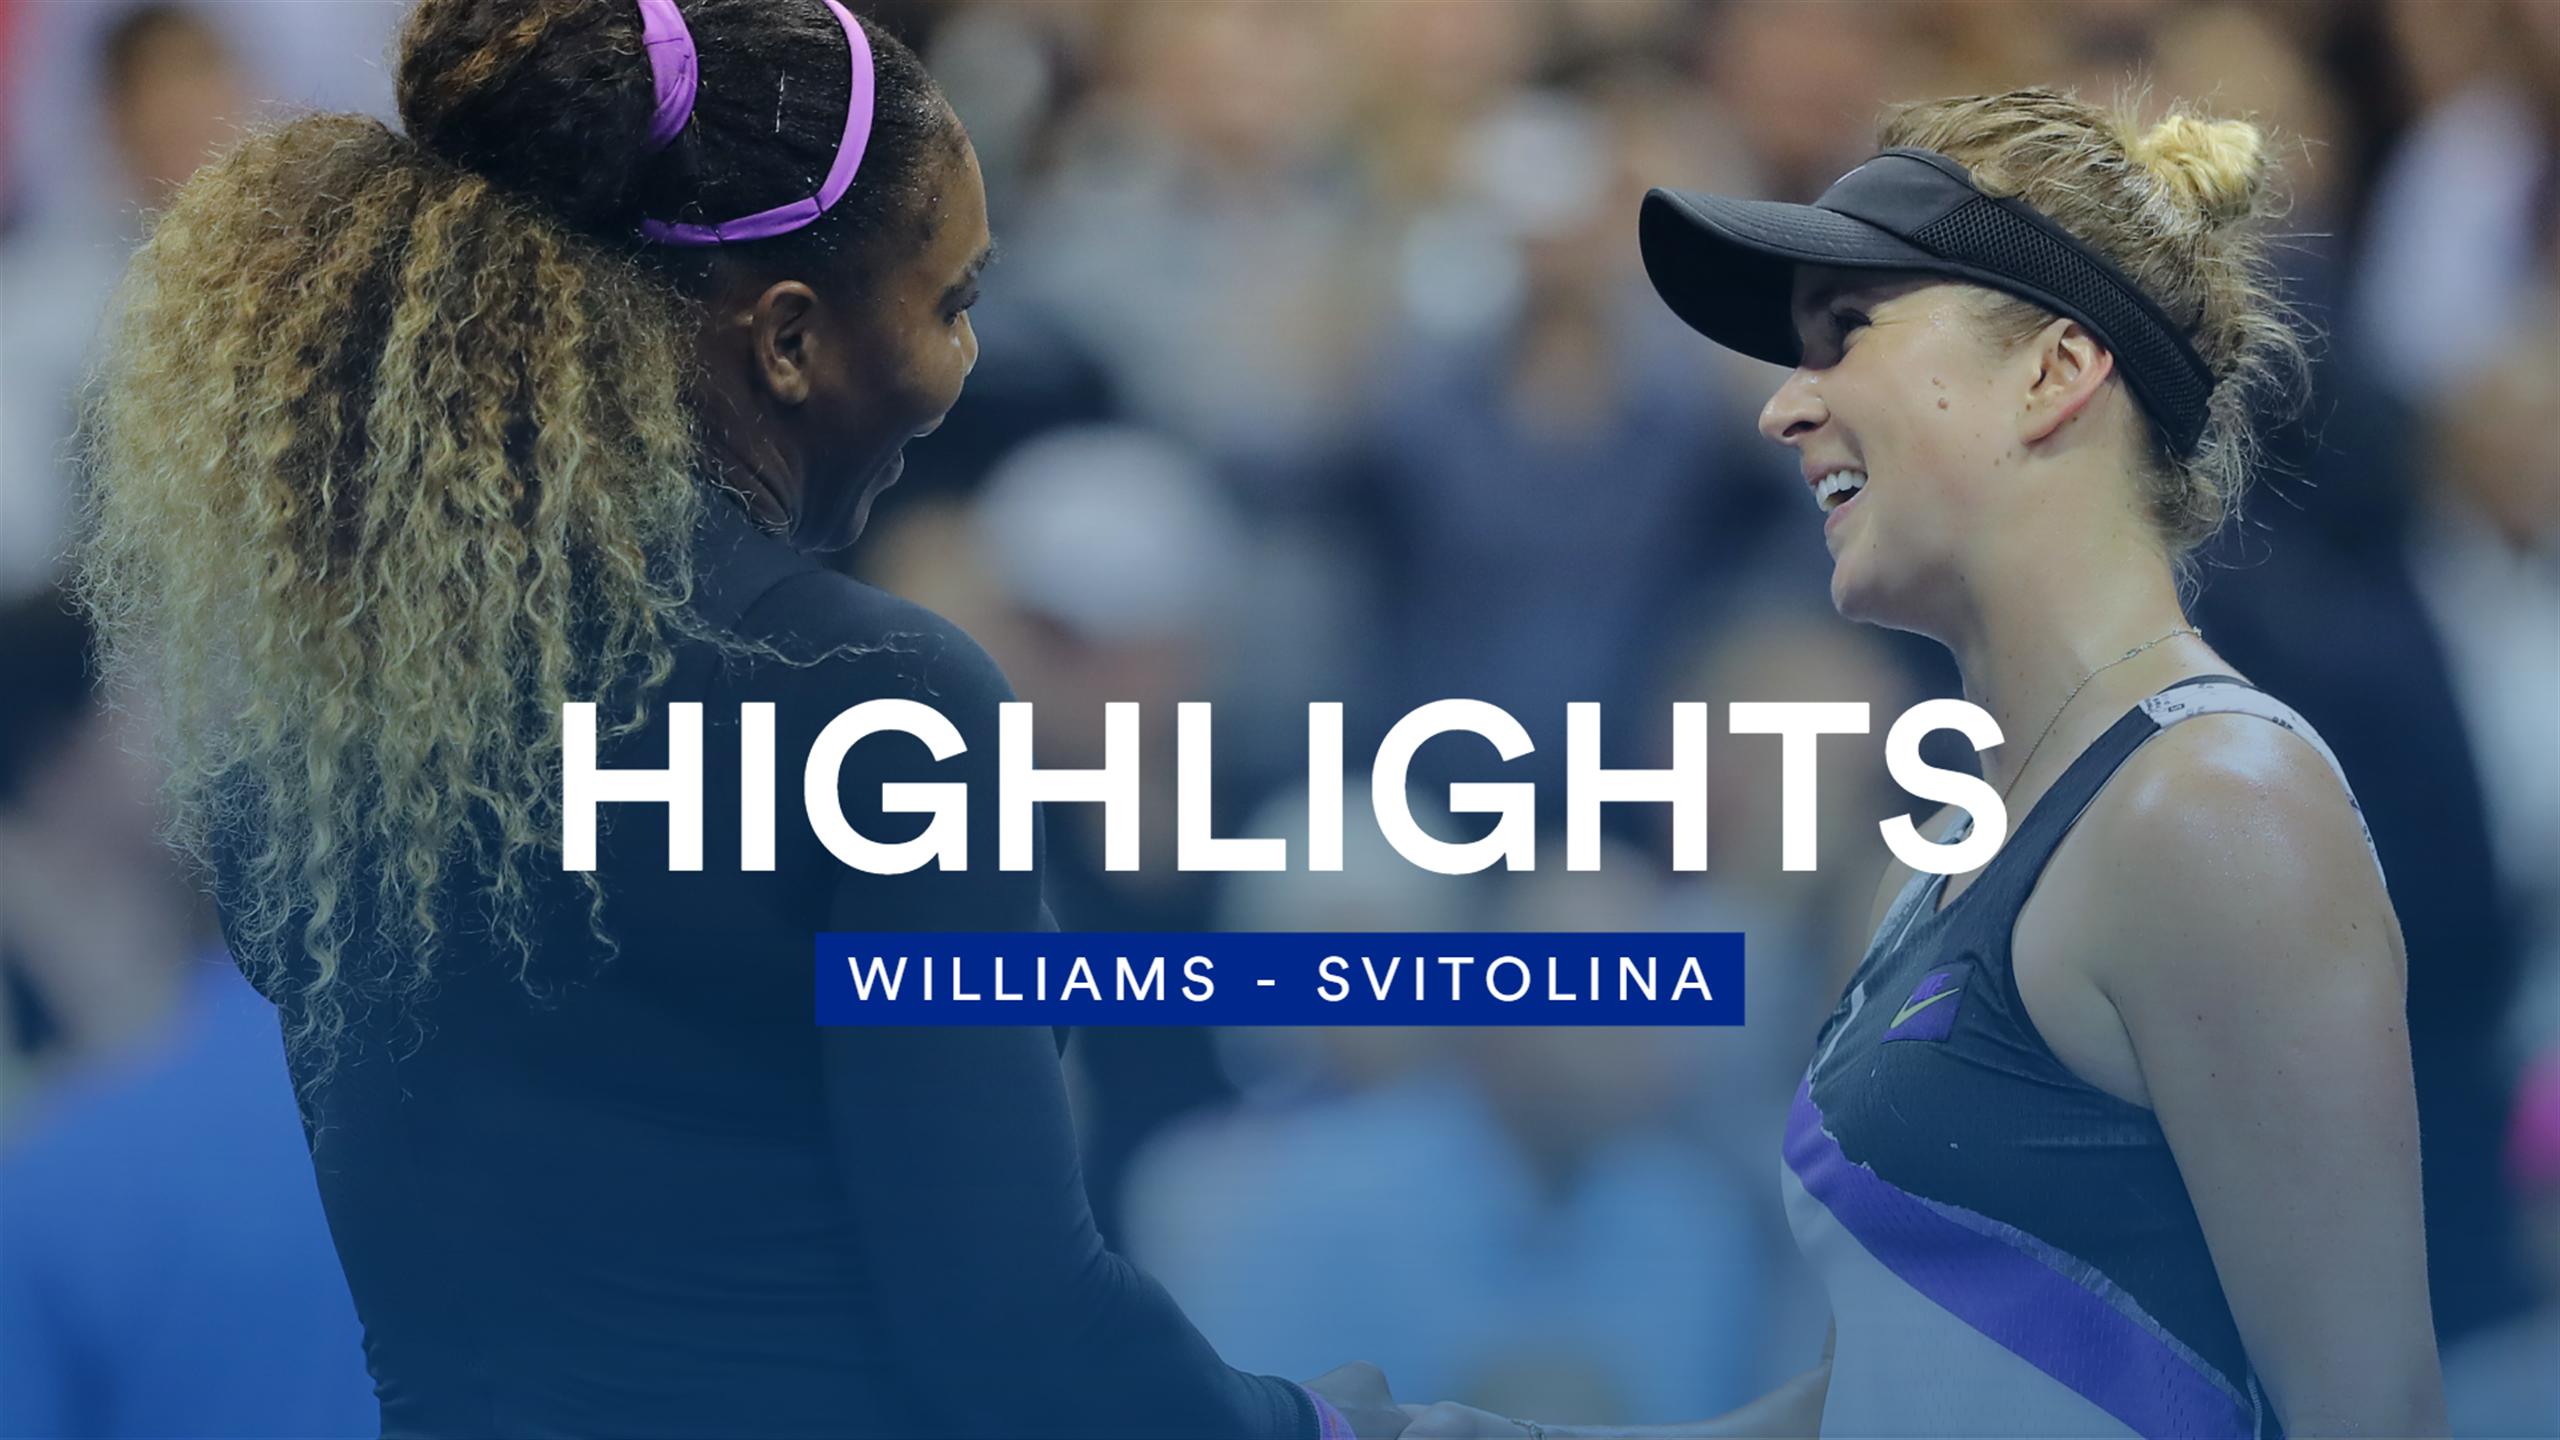 Обзор матча Элина Свитолина - Серена Уильямс на US Open (ВИДЕО)